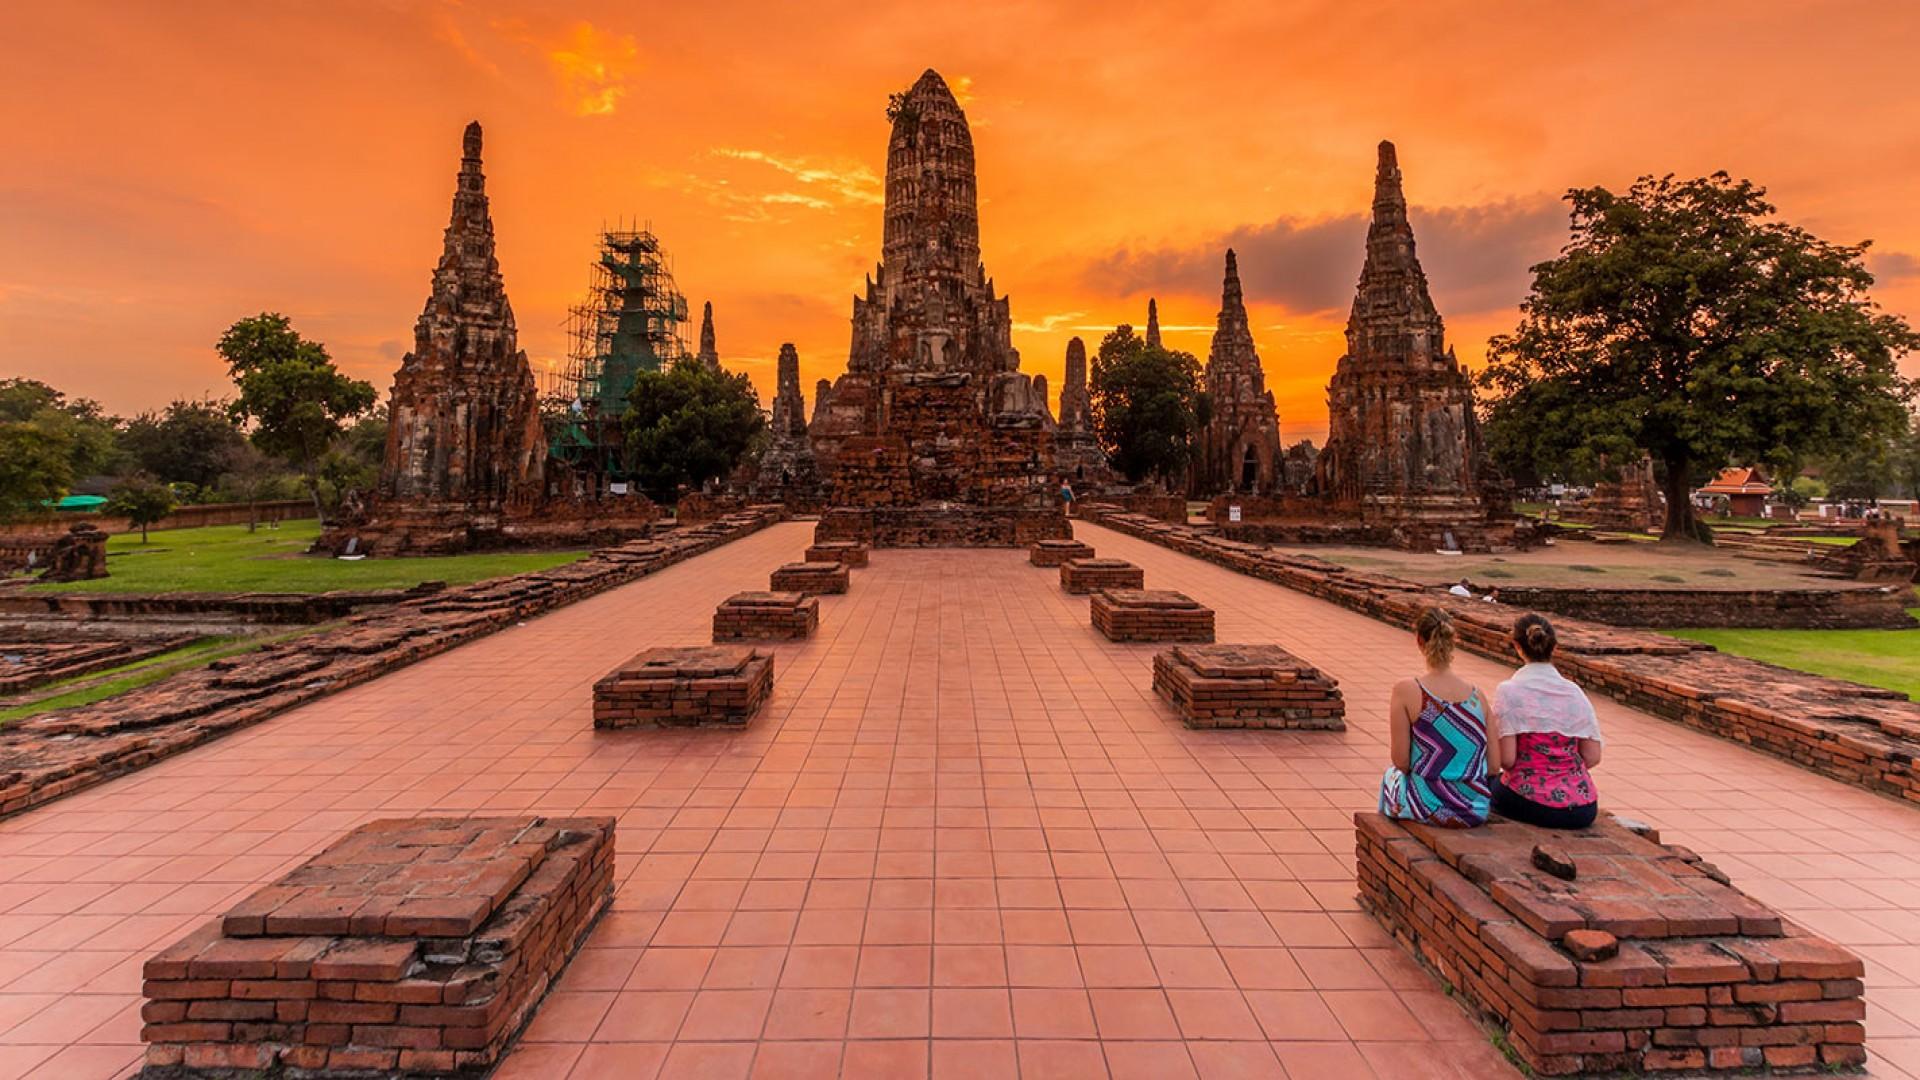 AYUTTHAYA - ANCIENT CAPITAL OF THAILAND